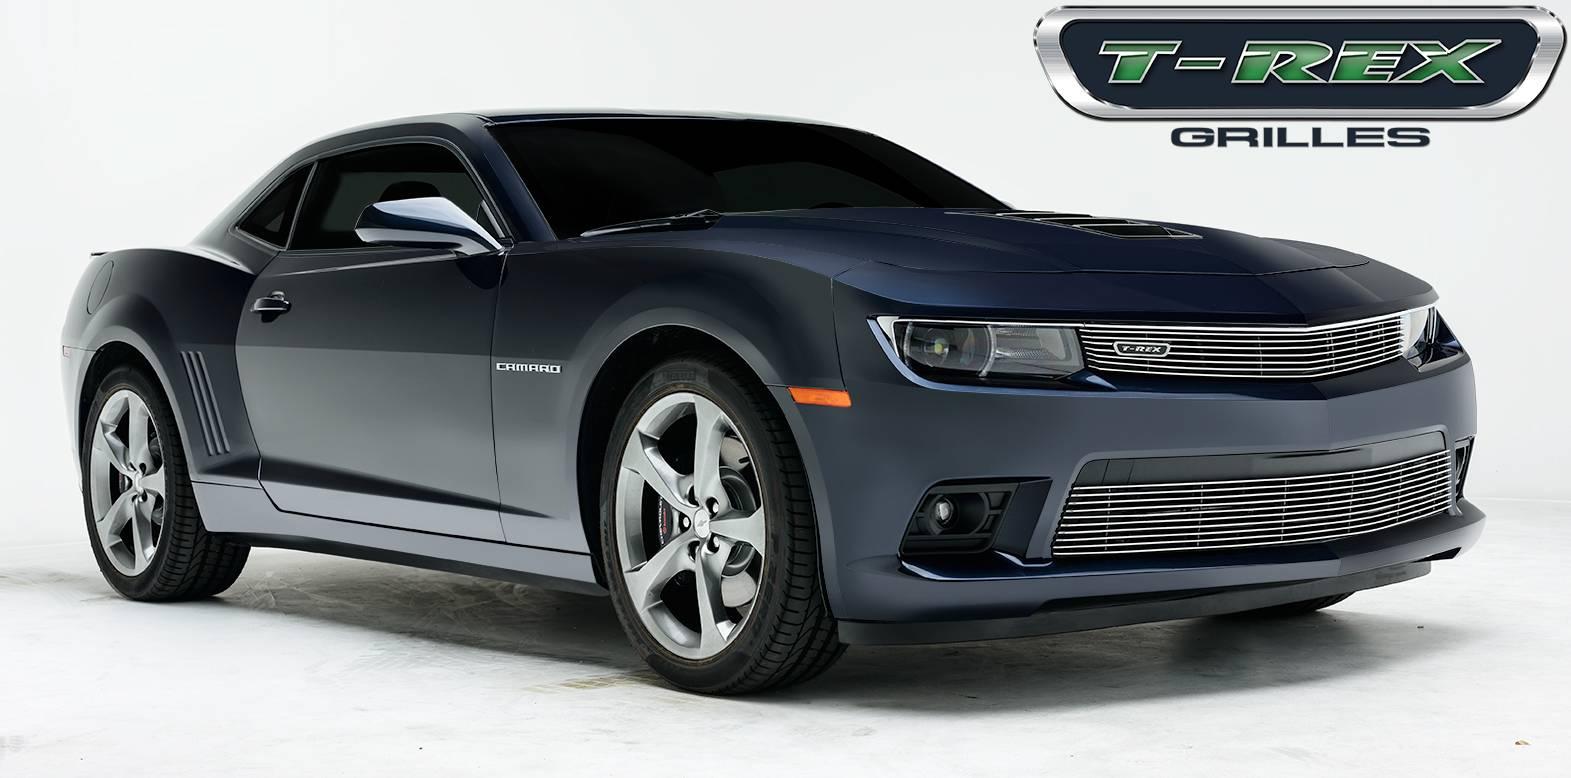 T-REX Grilles - Chevrolet Camaro SS Billet Grille, Bumper, Overlay, 1 Pc, Polished  Aluminum Bars - Pt # 25032